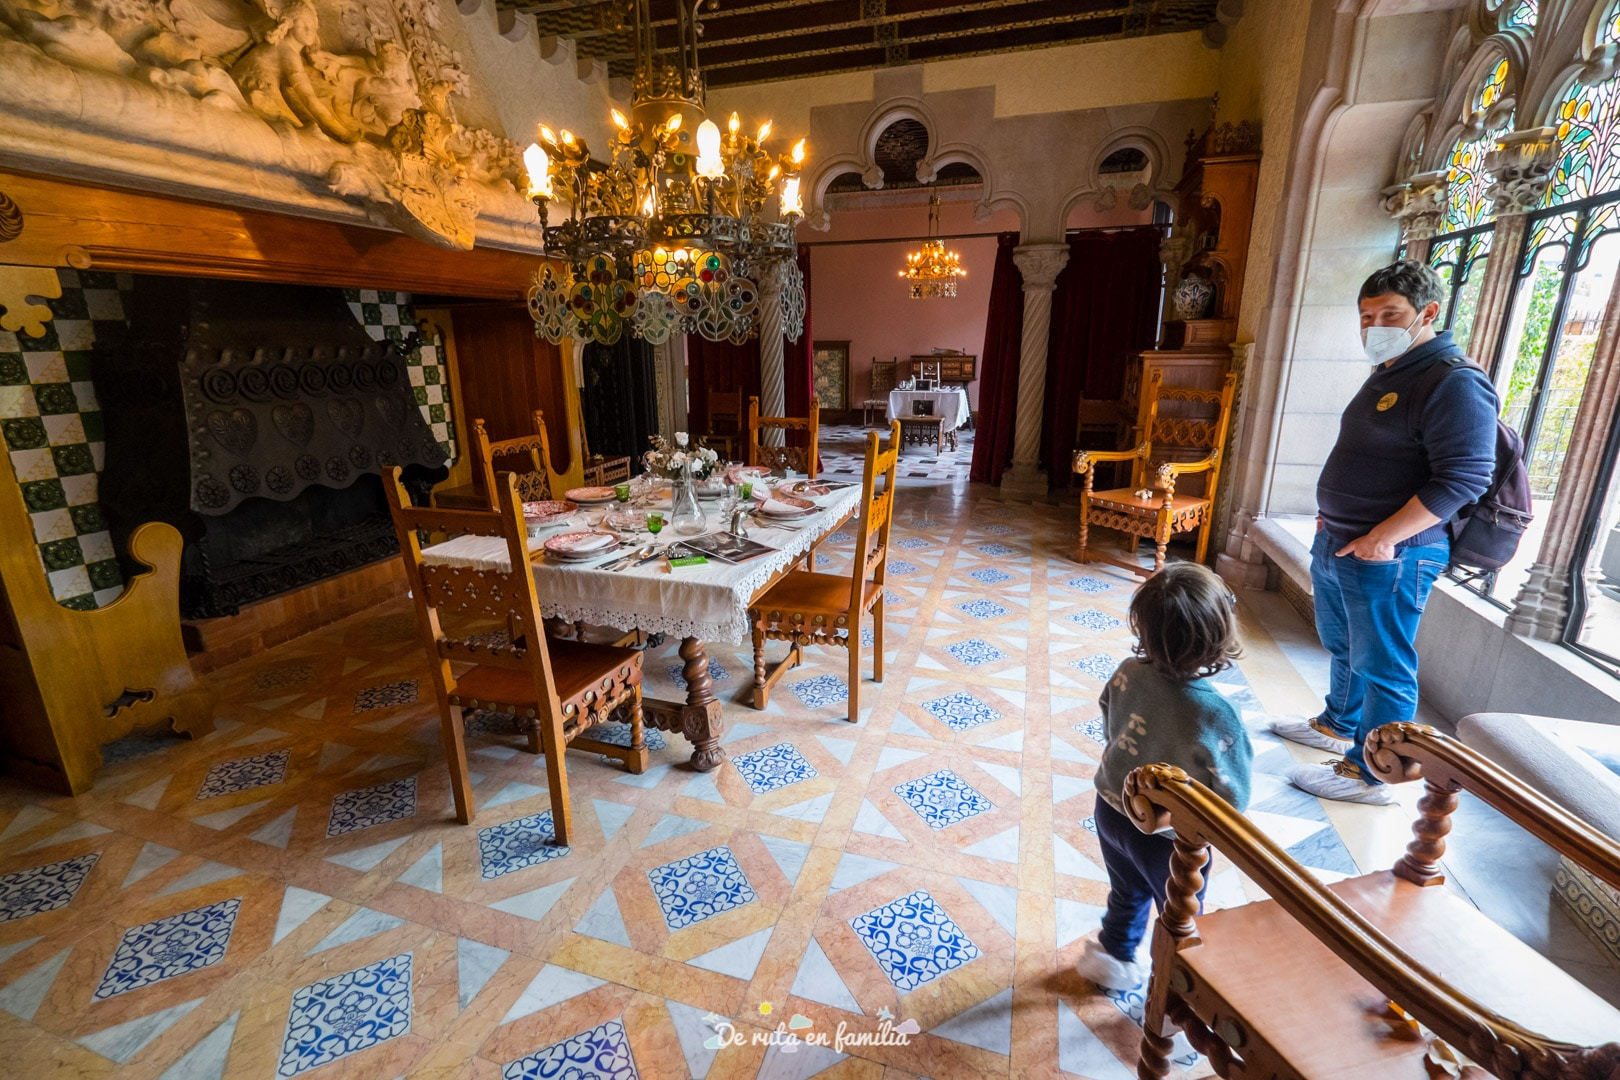 Casa Amatller. Cases singulars de Barcelona amb nens